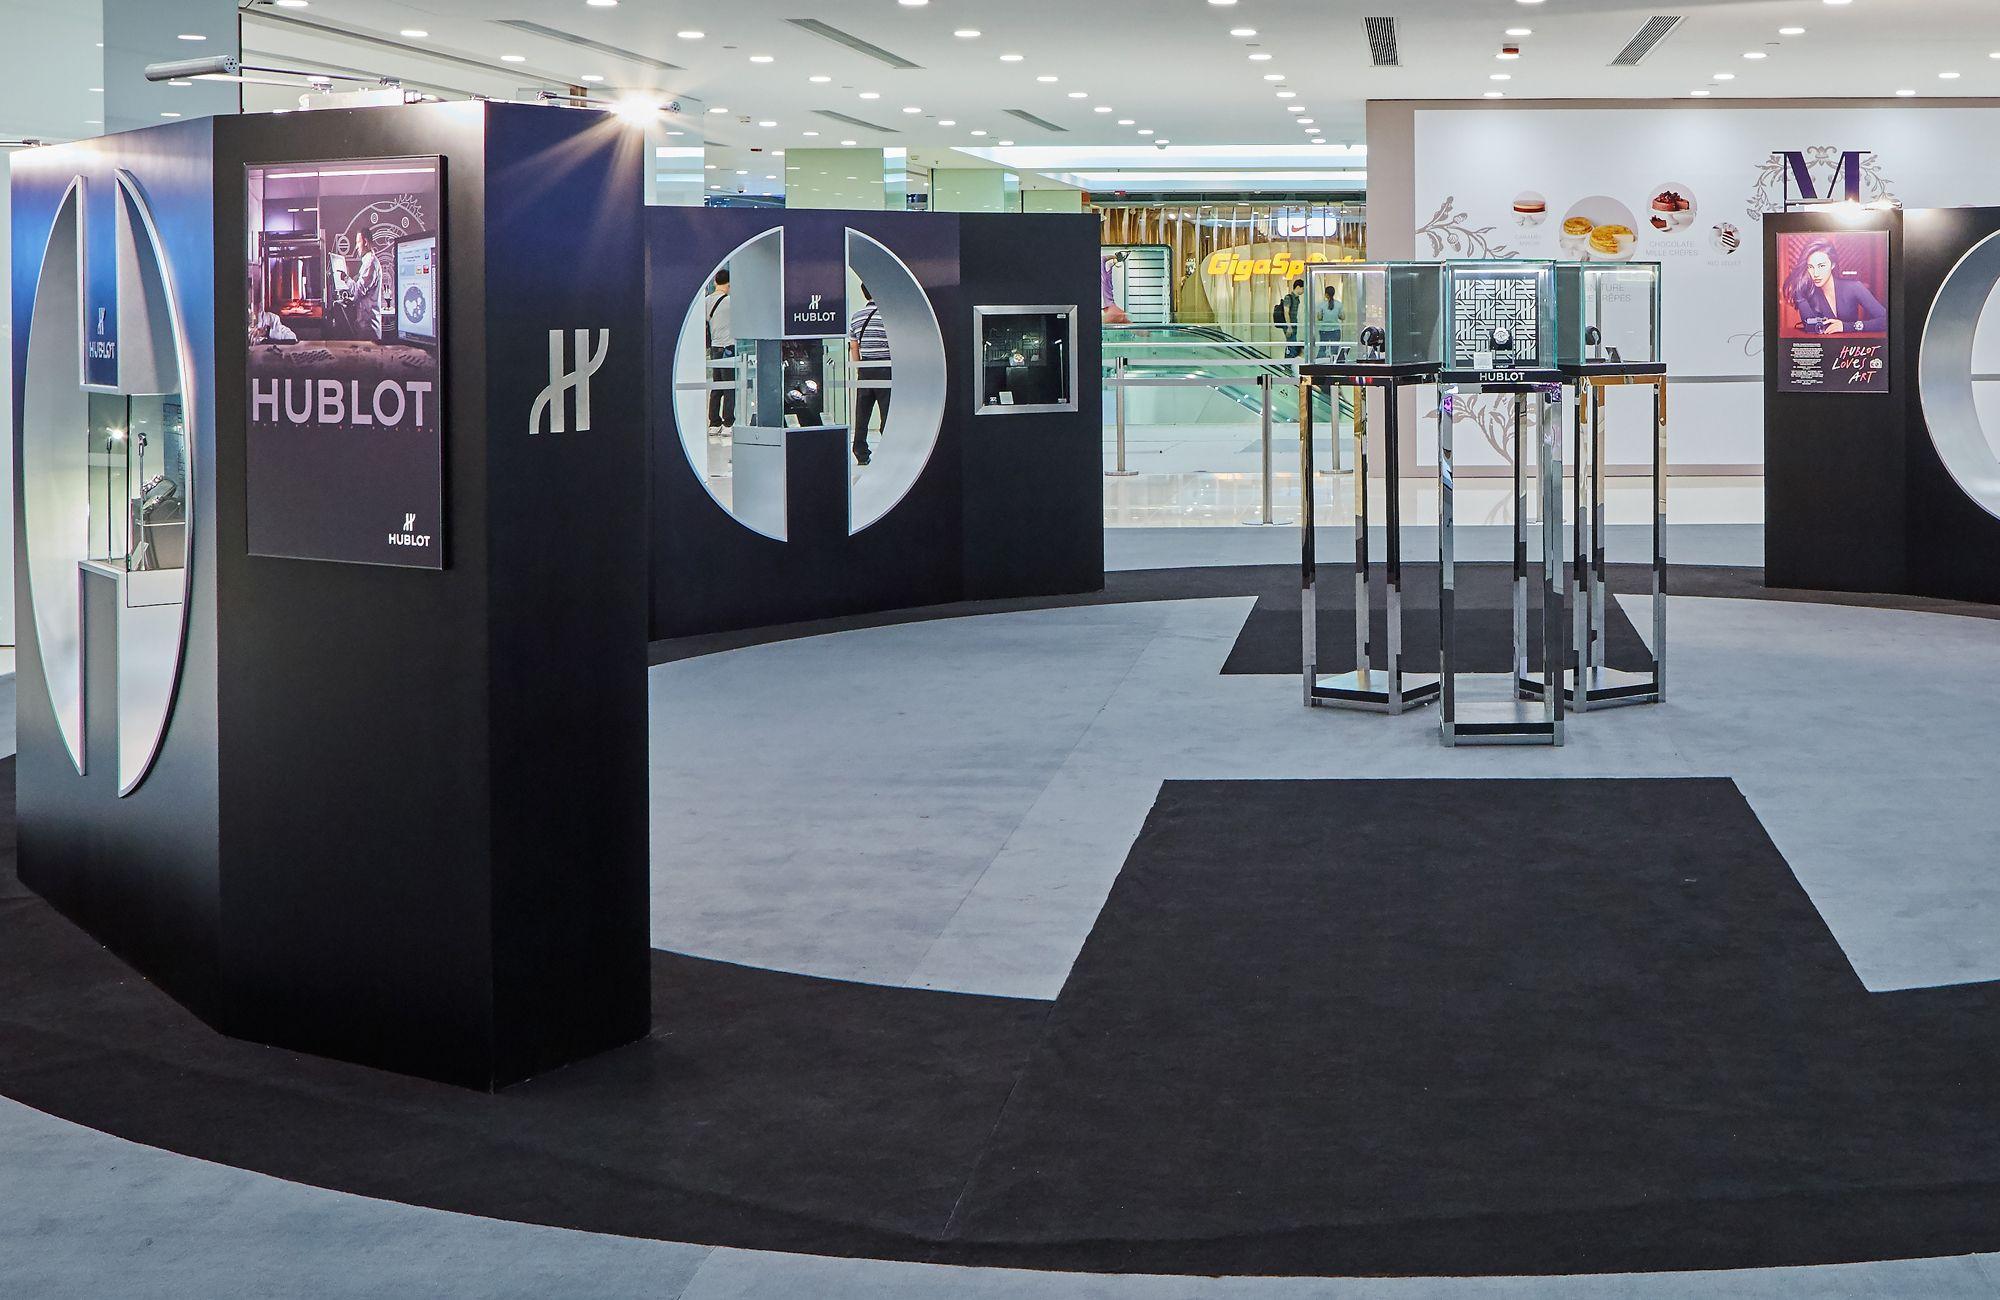 Hublot's Big Bang Grand Tour Arrives in Hong Kong